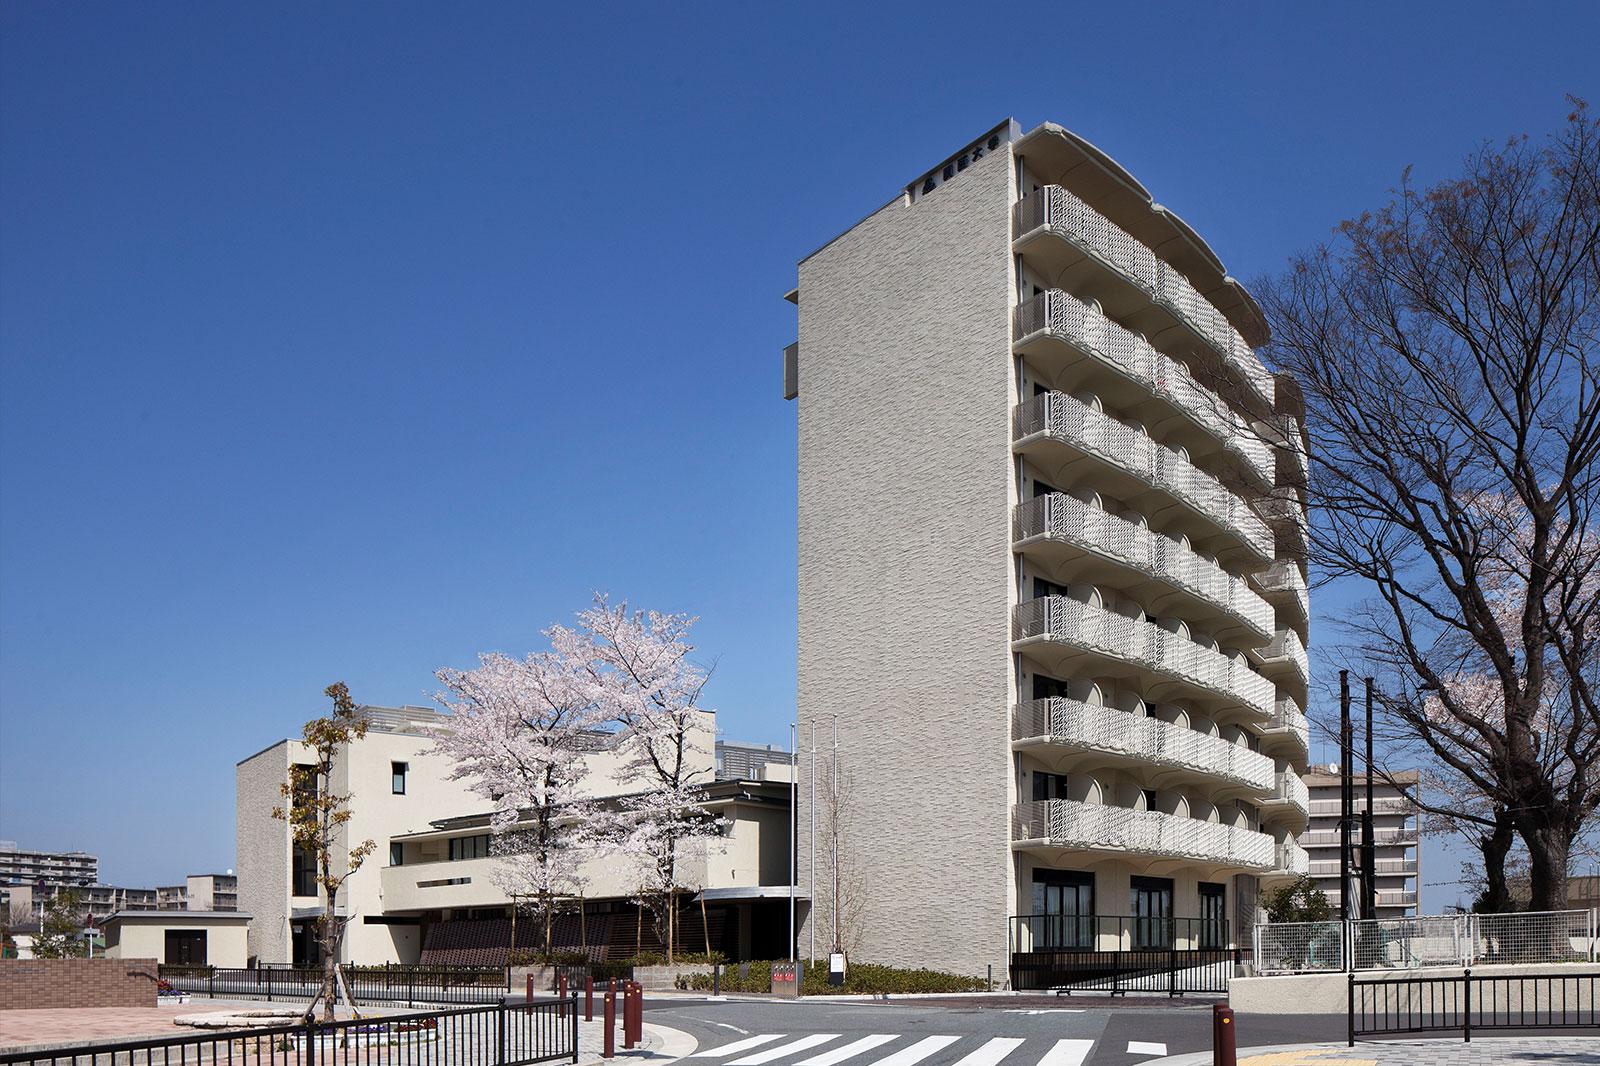 関西大学 南千里国際プラザ